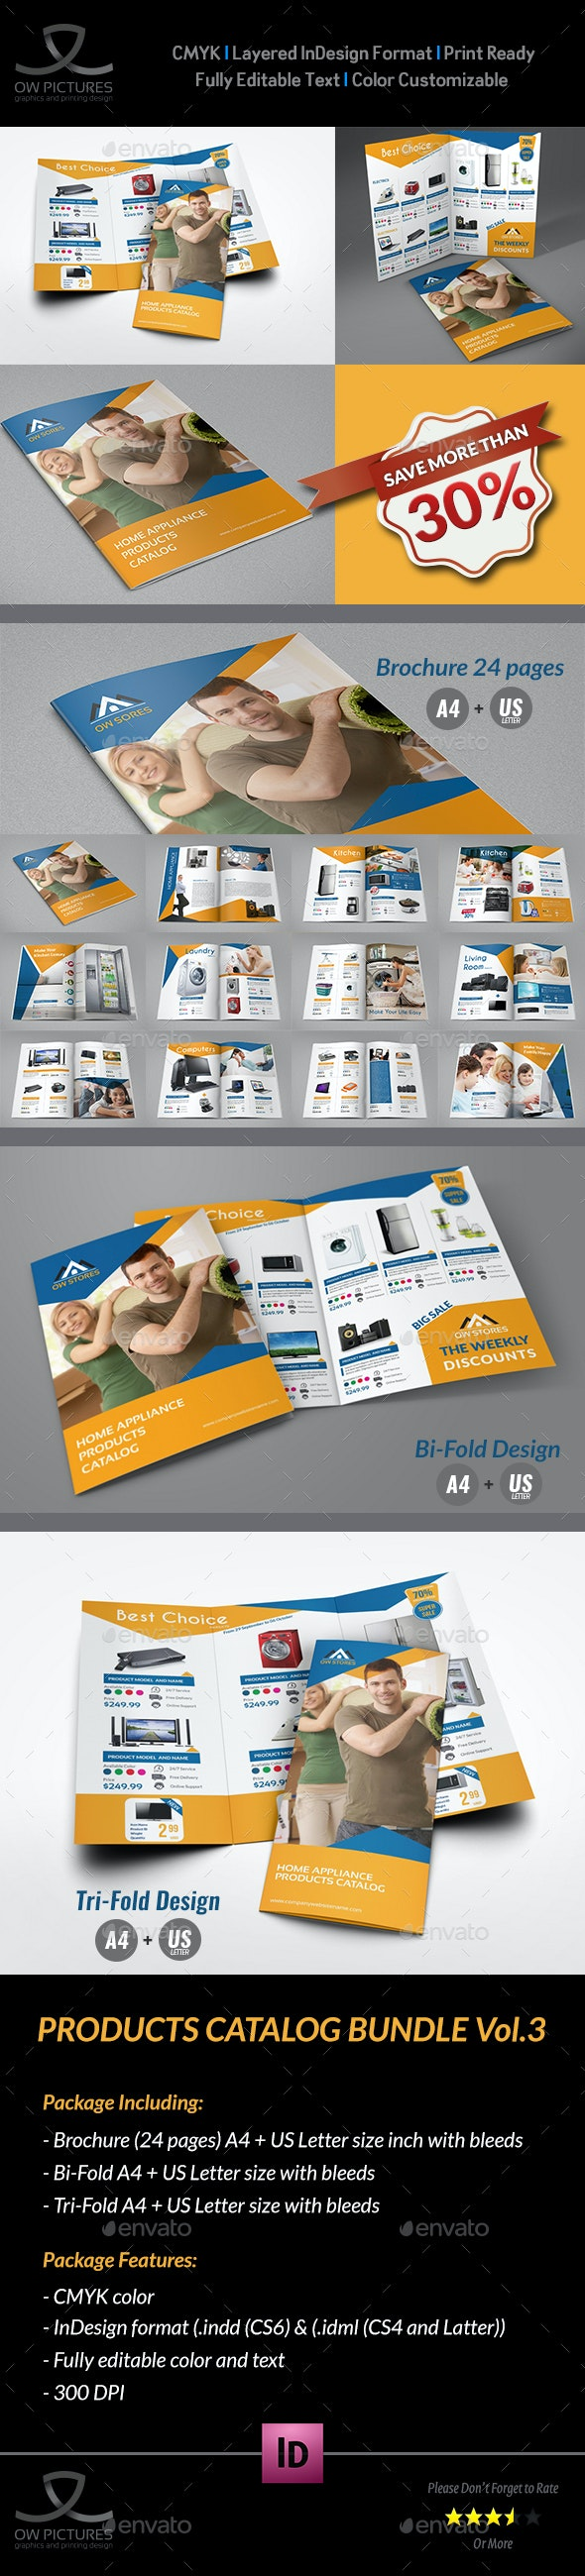 Products Catalog Brochure Bundle Vol.3 - Catalogs Brochures